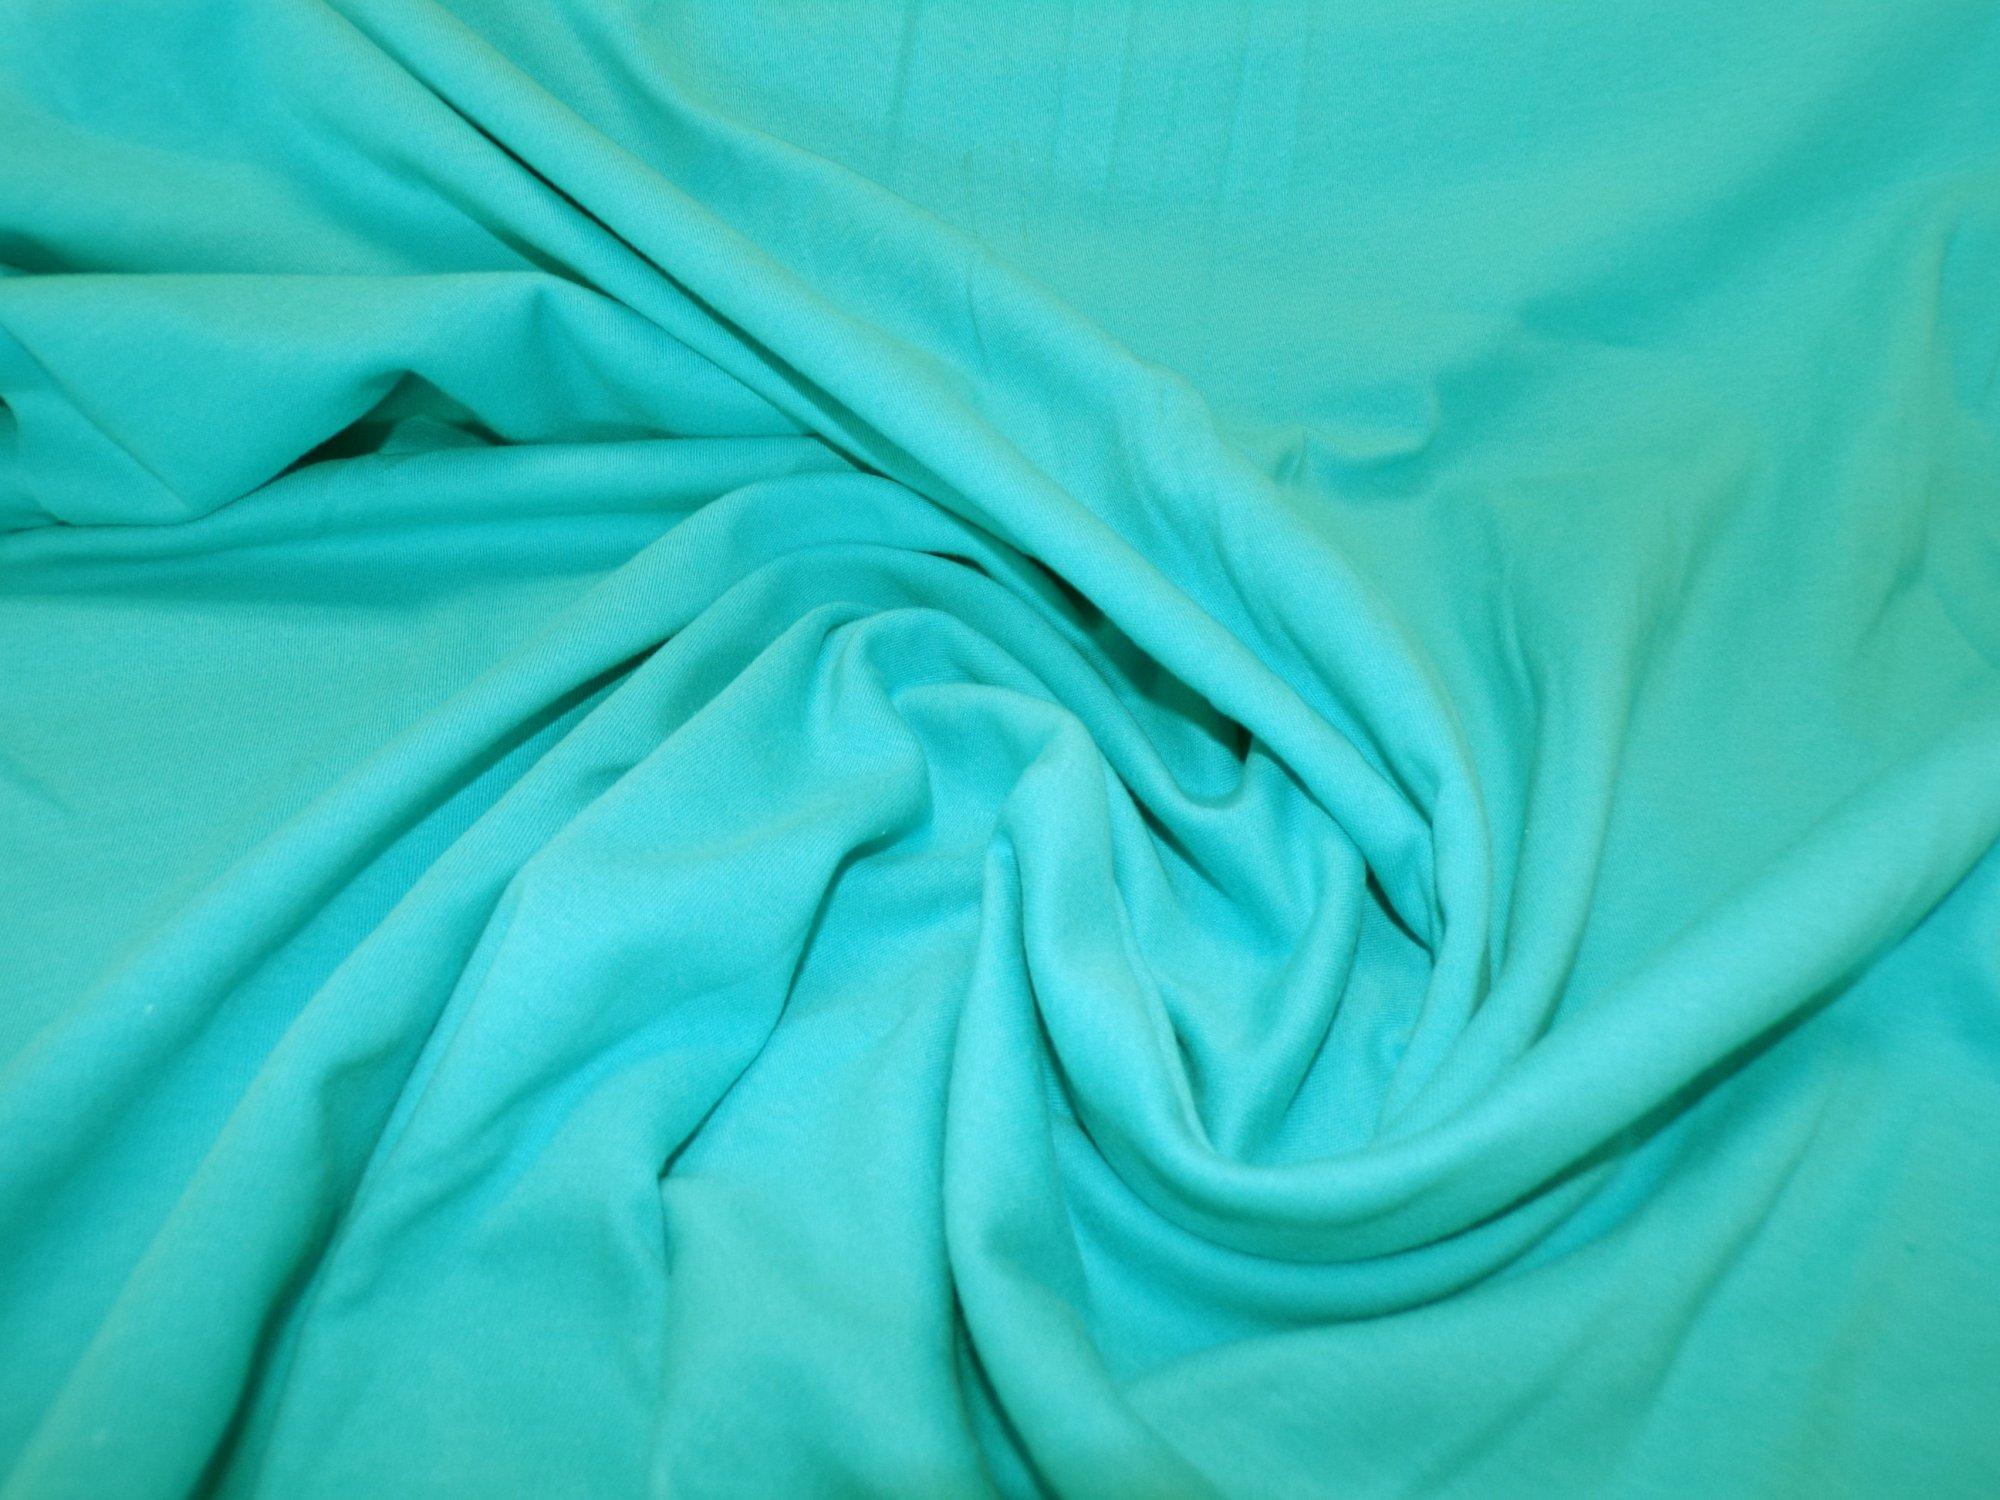 Nylon Lycra Swimwear - Turquoise